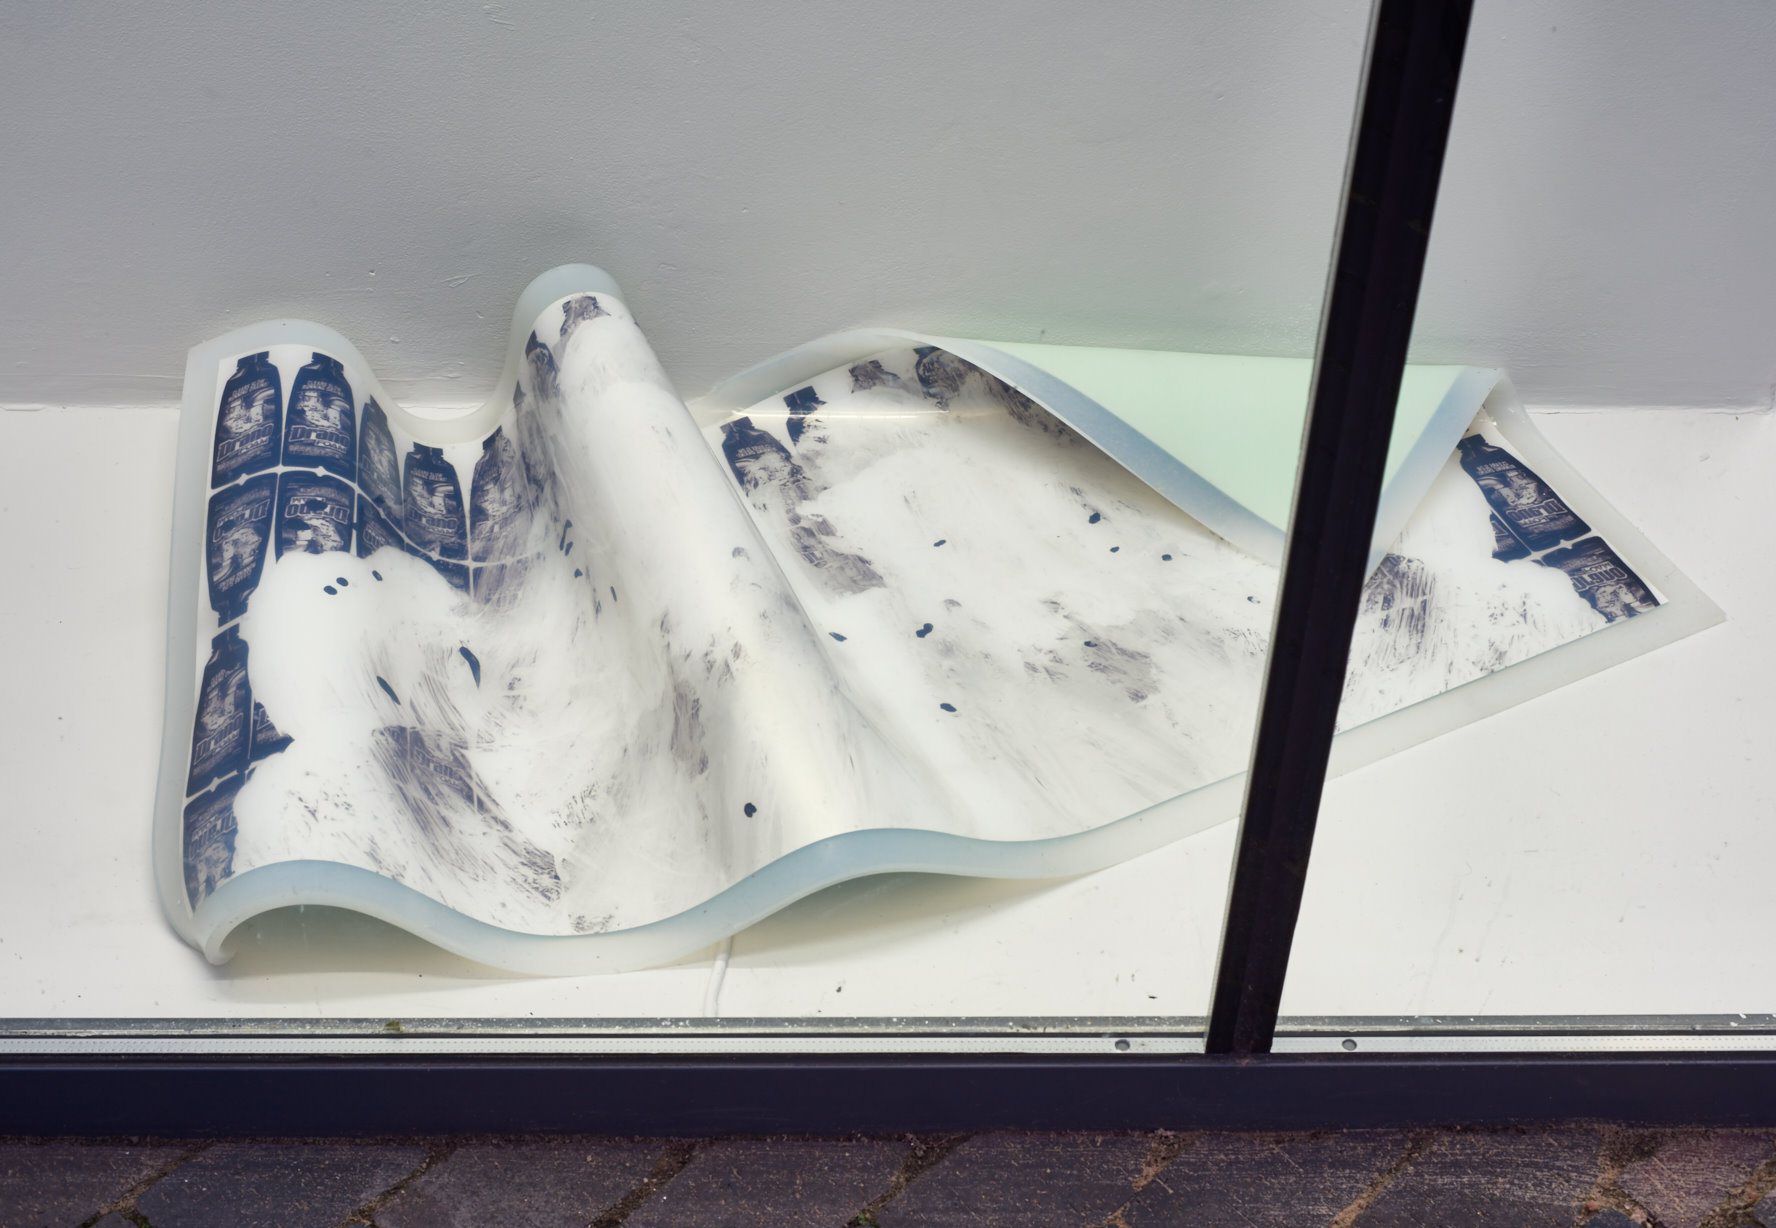 Charlie Godet Thomas, Torschlusspanik, 2015. Installation View. VITRINE, London. Photographer: Jonathan Bassett.